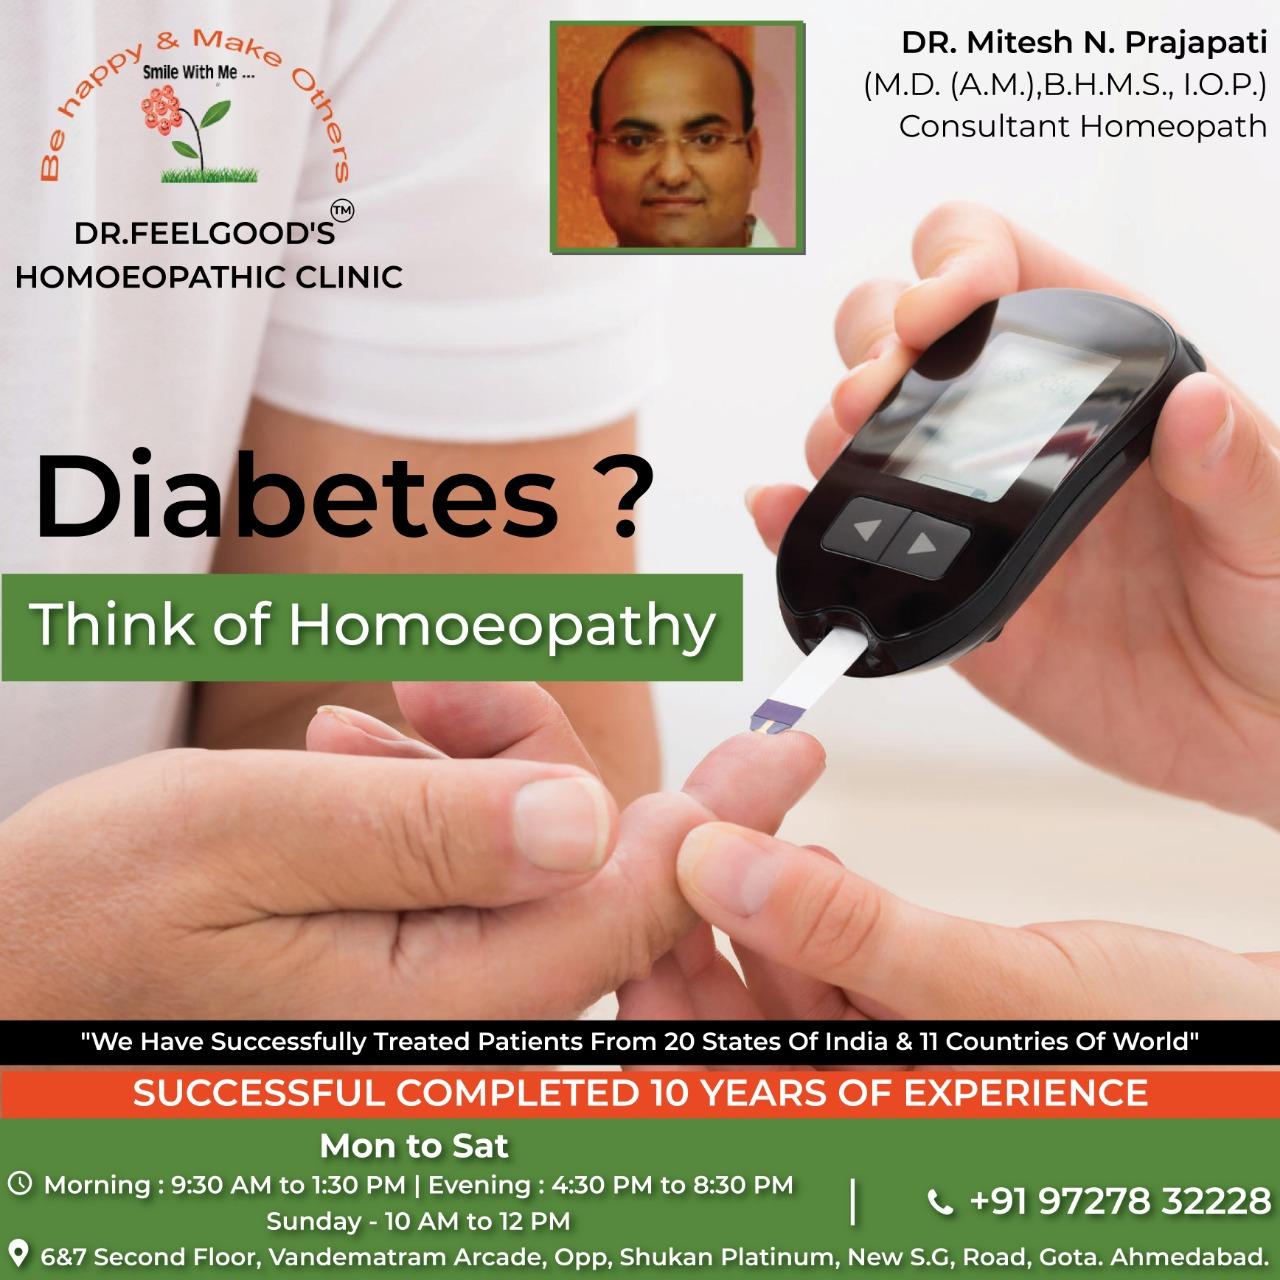 DR.MITESH PRAJAPATI- HOMEOPATHY FOR DIABETES (3)